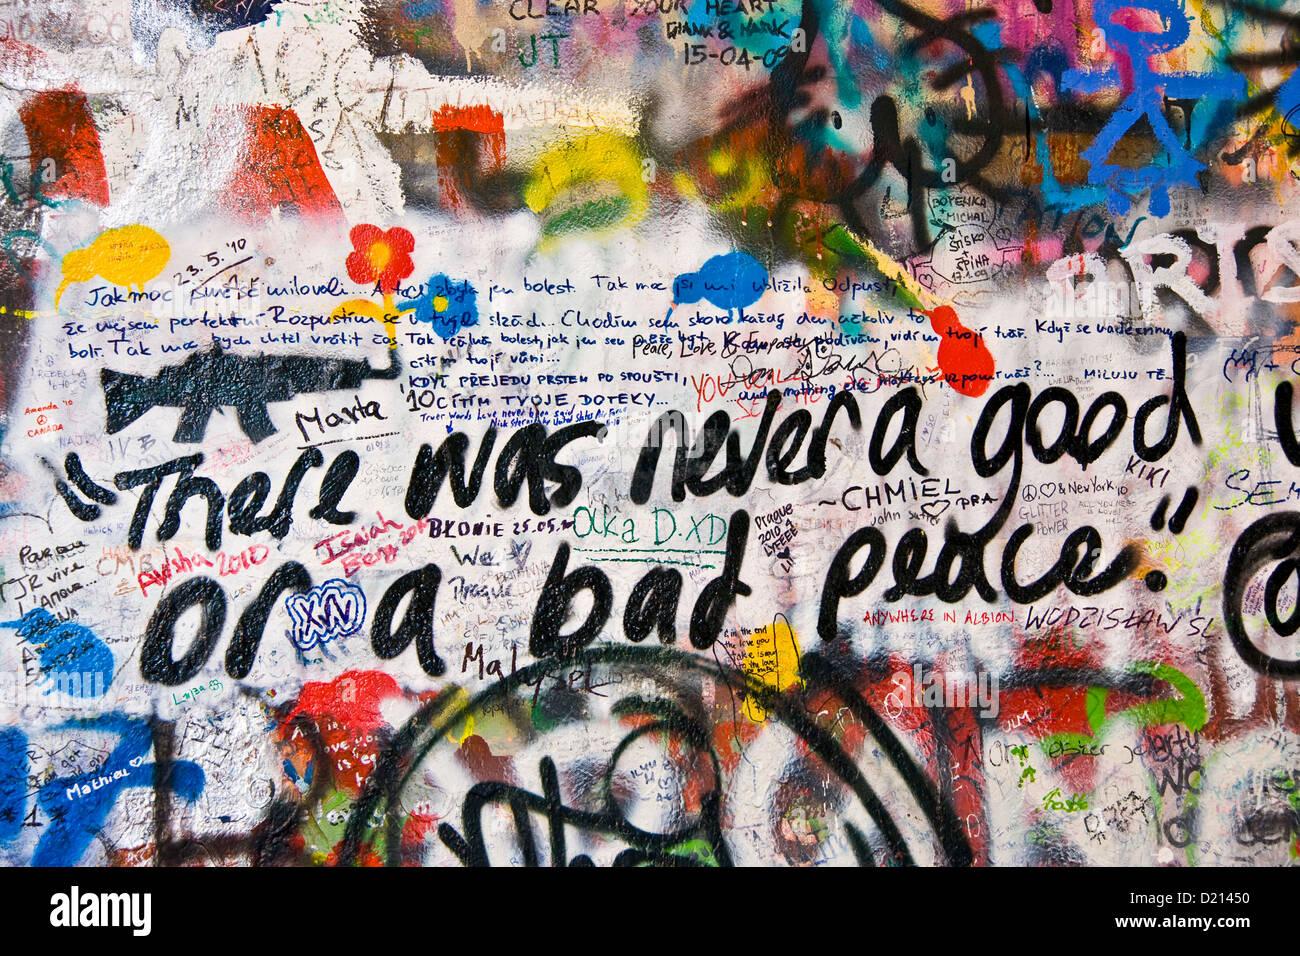 Urban graffiti street art slogan words on John Lennon Wall Prague Czech Republic Europe - Stock Image